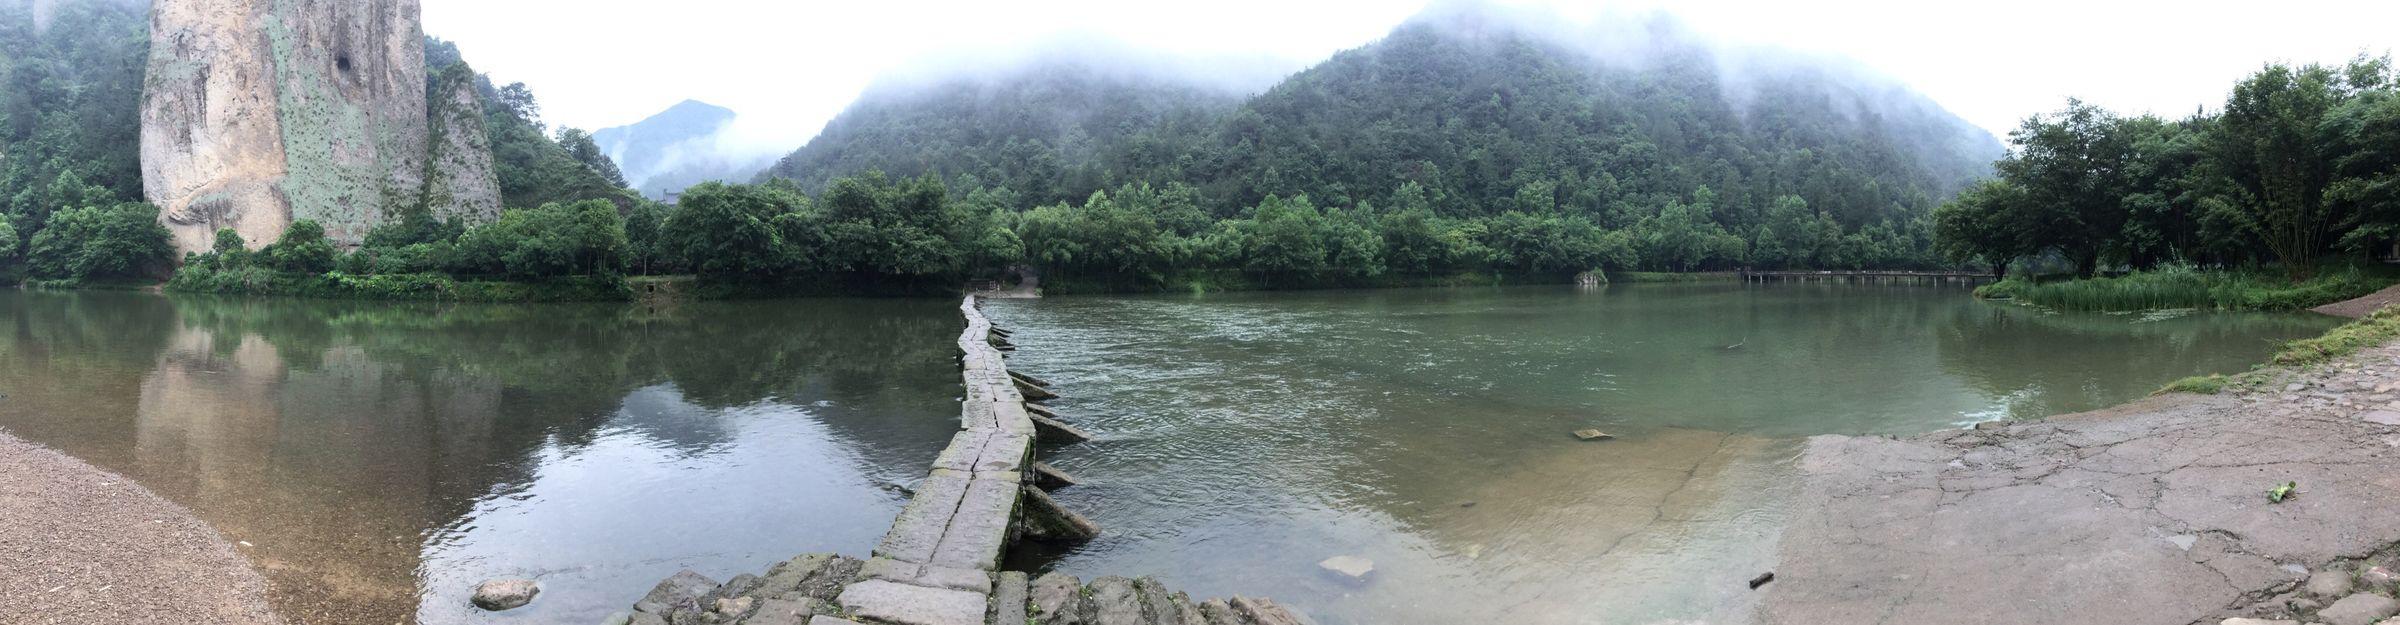 By Lee Bridge Fog Trees River Mountains